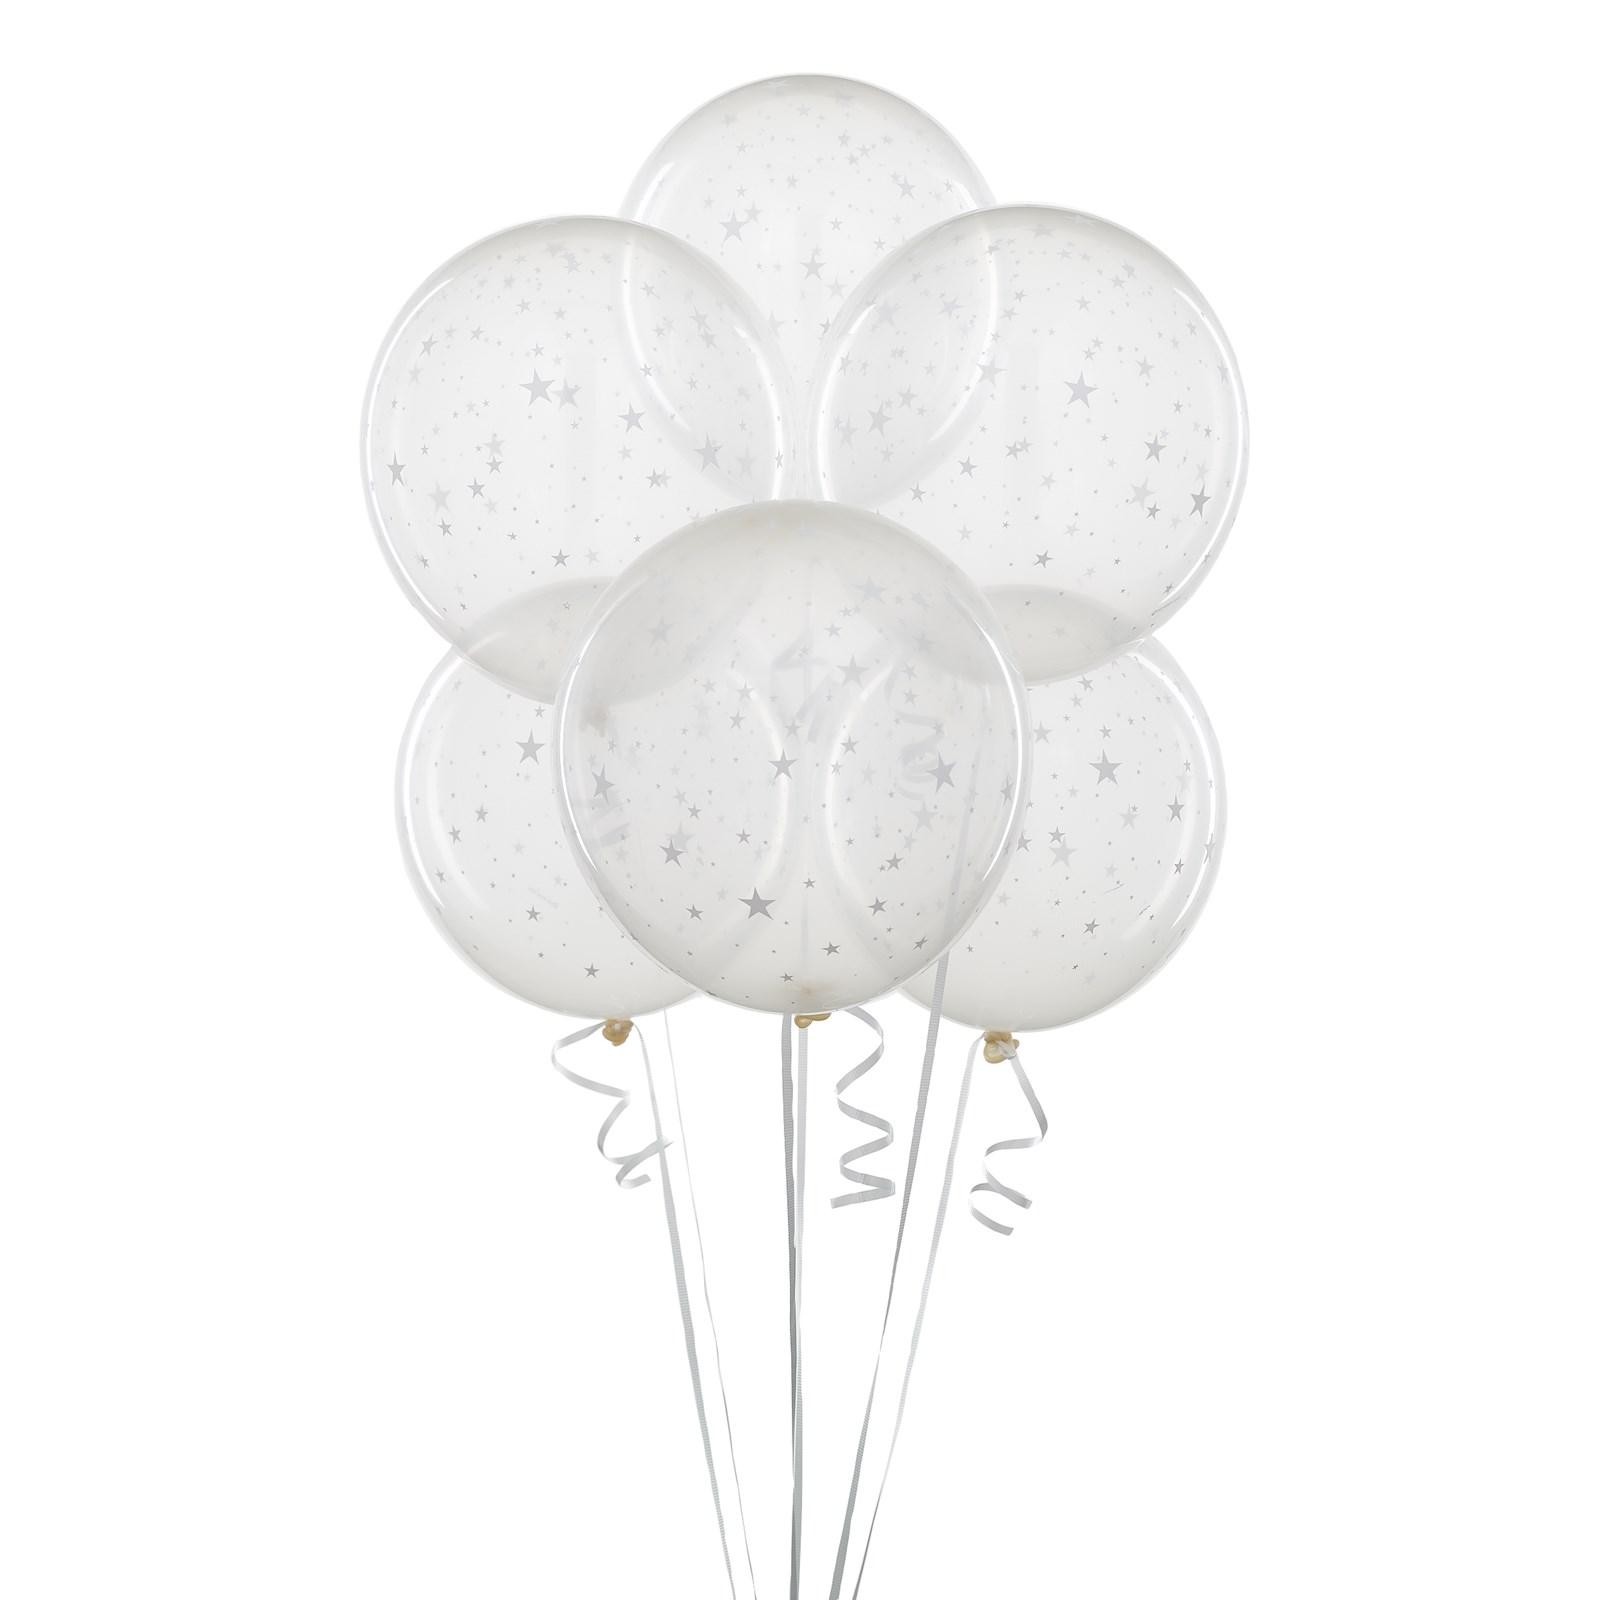 Clear Balloons With Stars BirthdayExpresscom